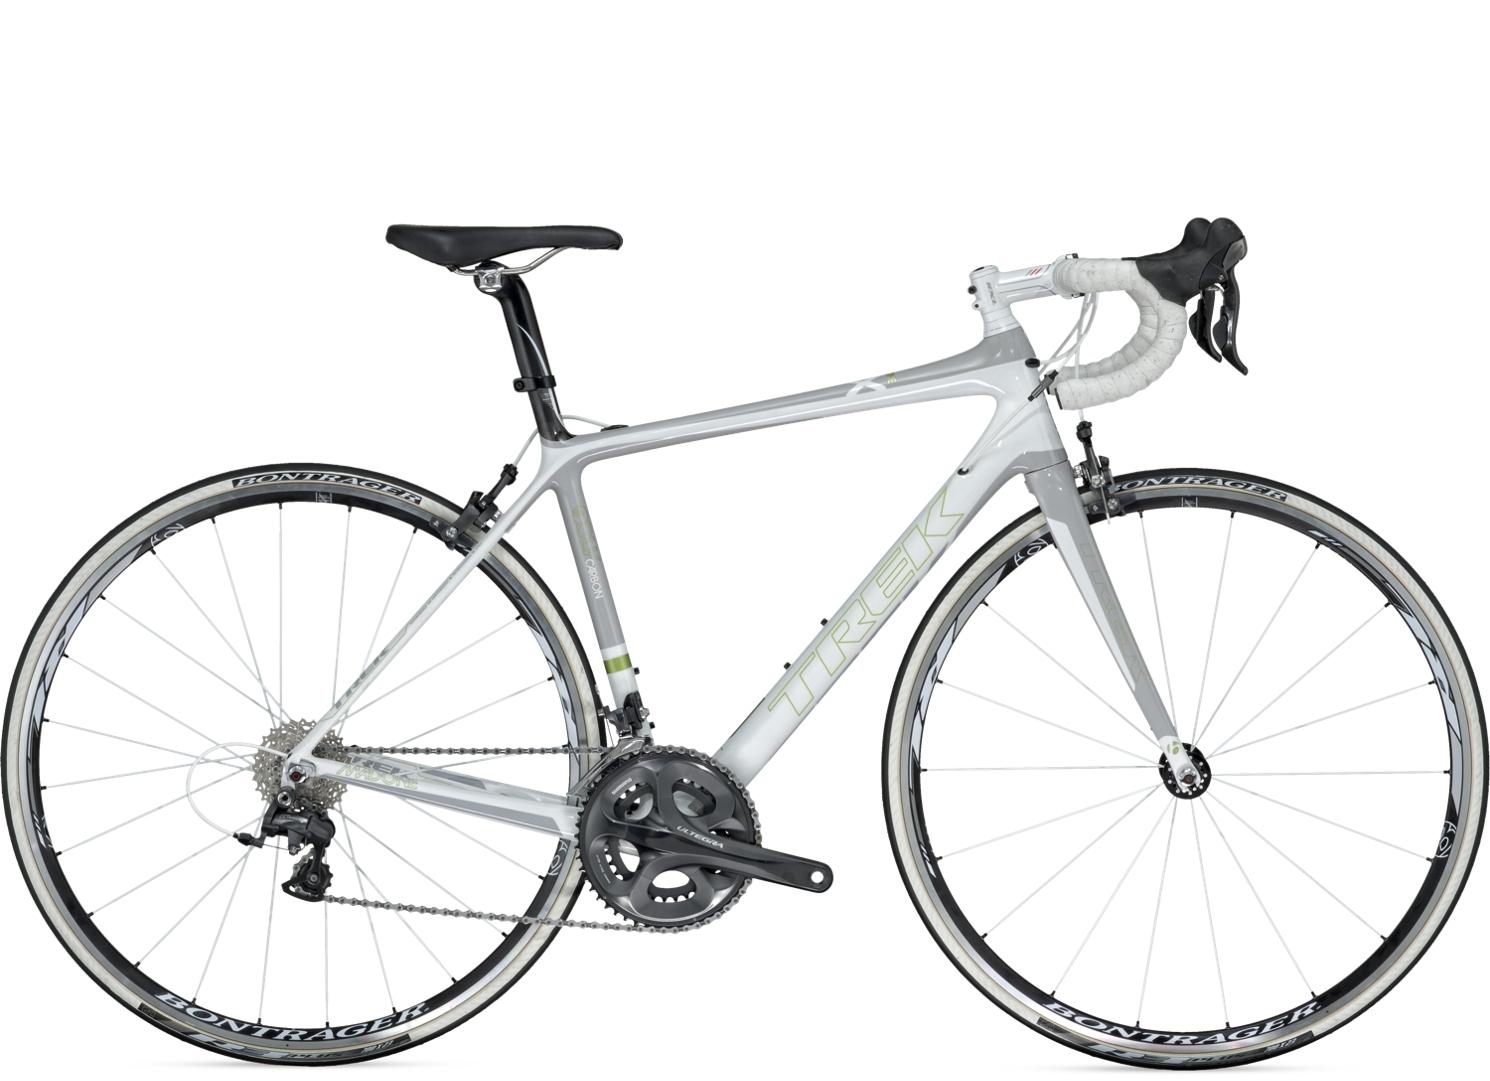 2012 Madone 6.2 WSD (Compact) - Bike Archive - Trek Bicycle